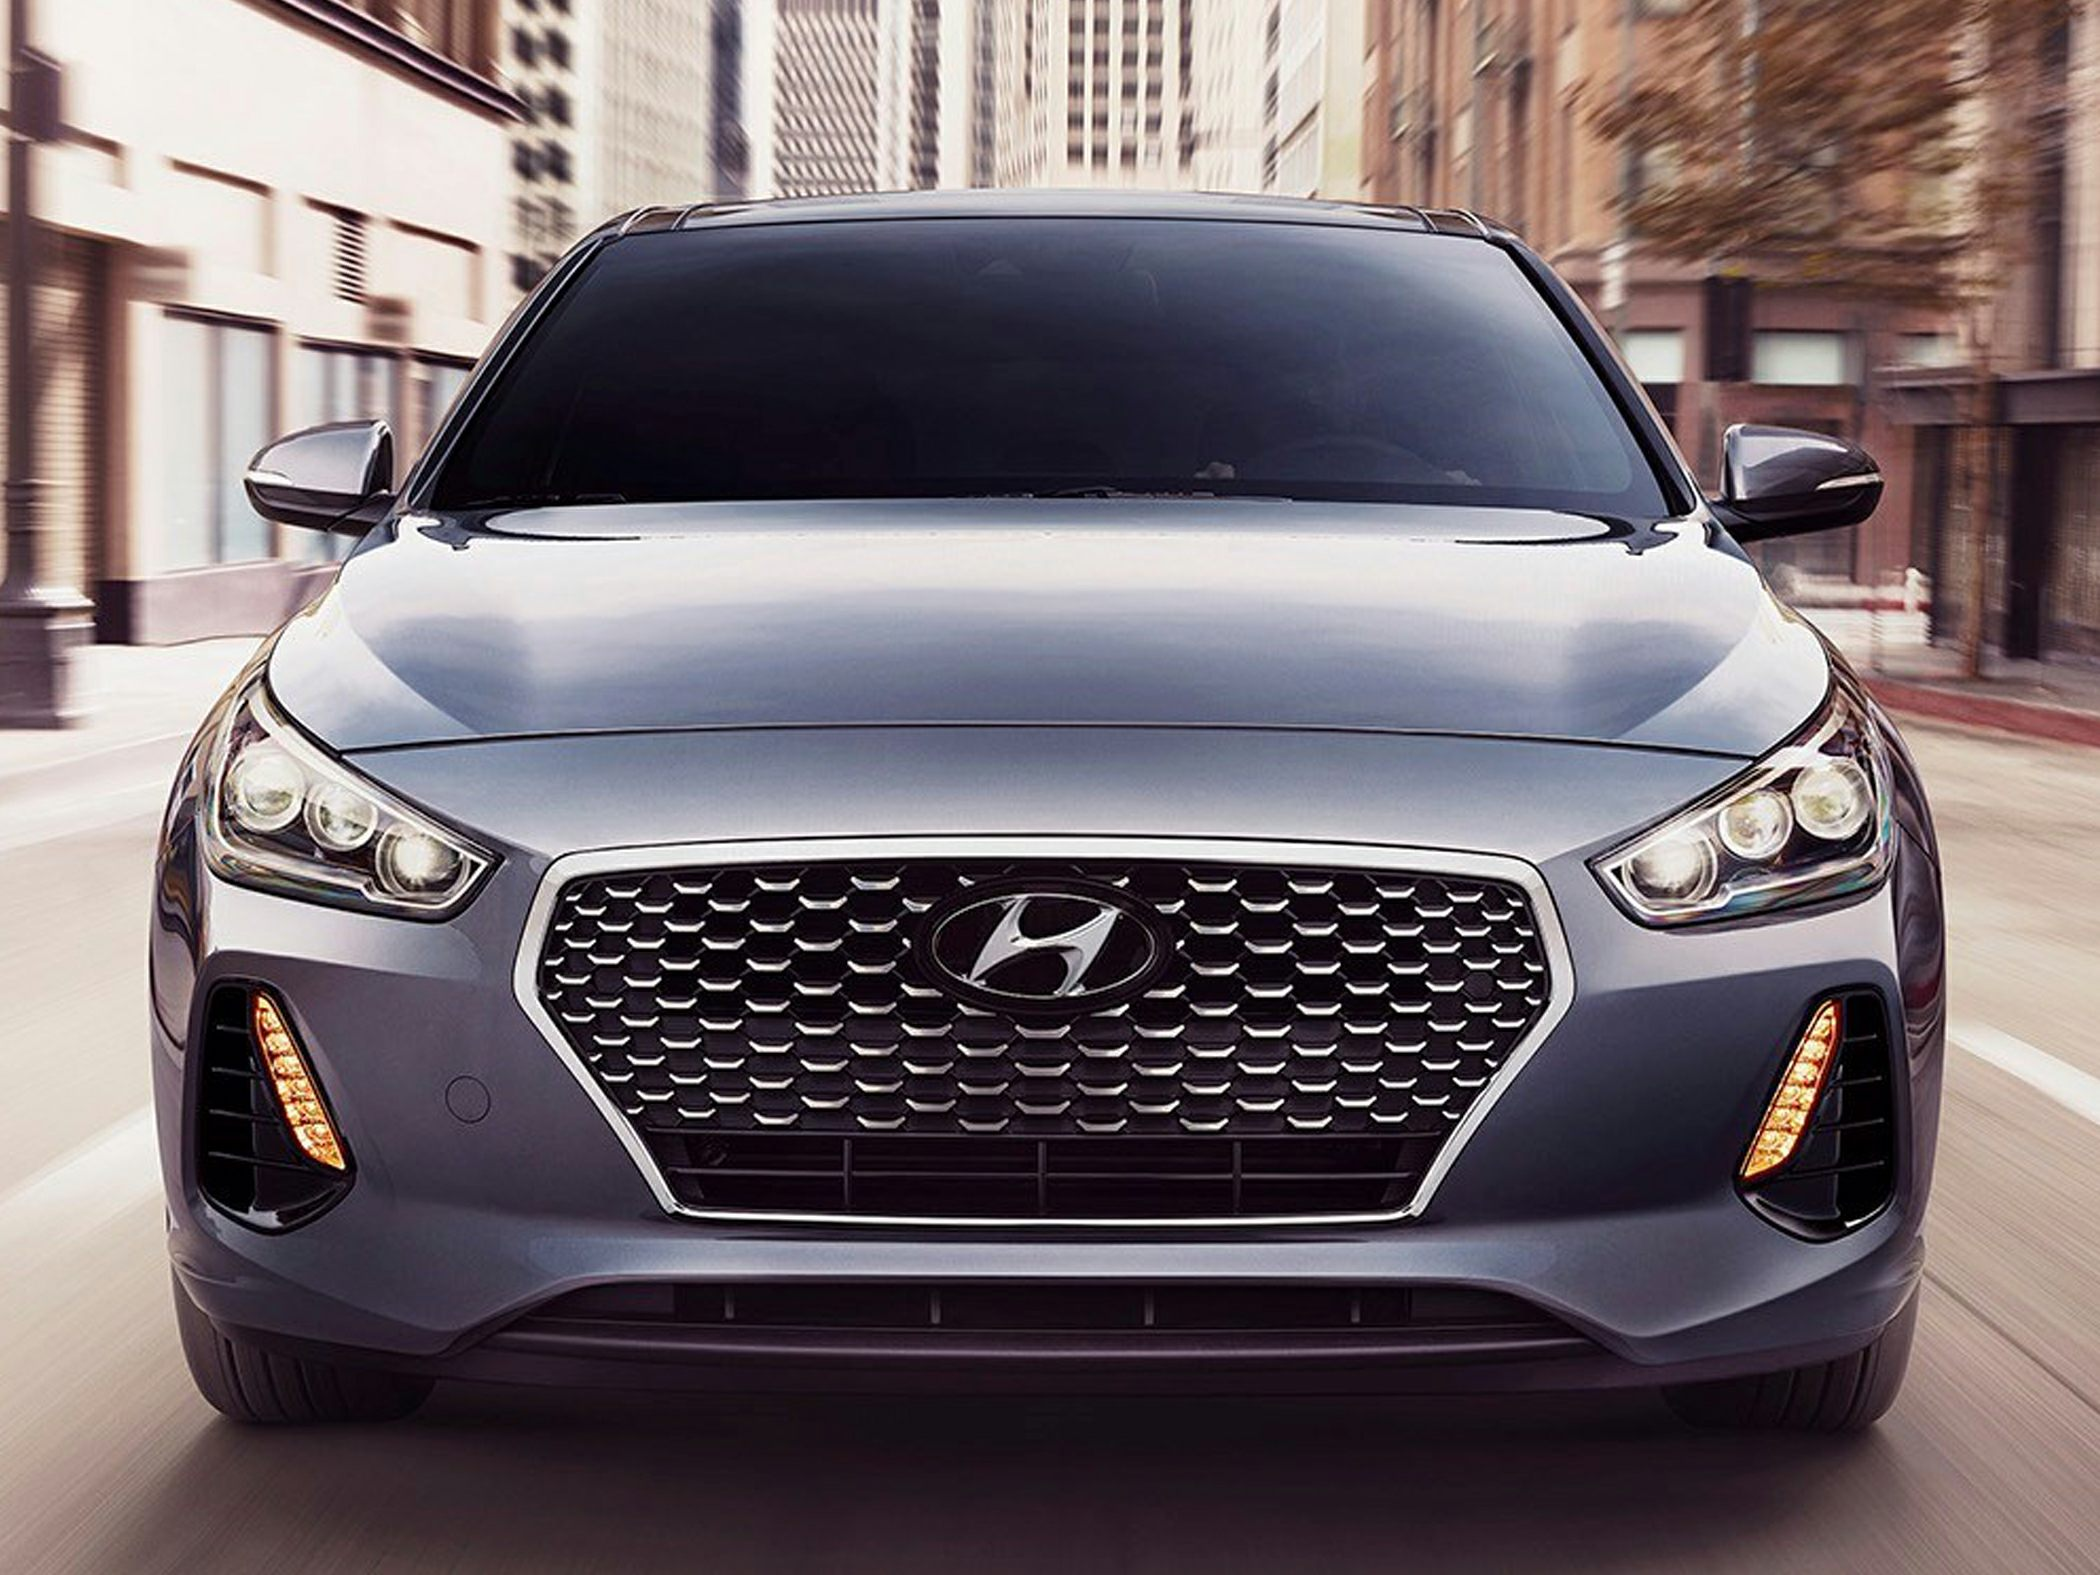 2019 Hyundai Elantra GT: Preview, Pricing, Release Date